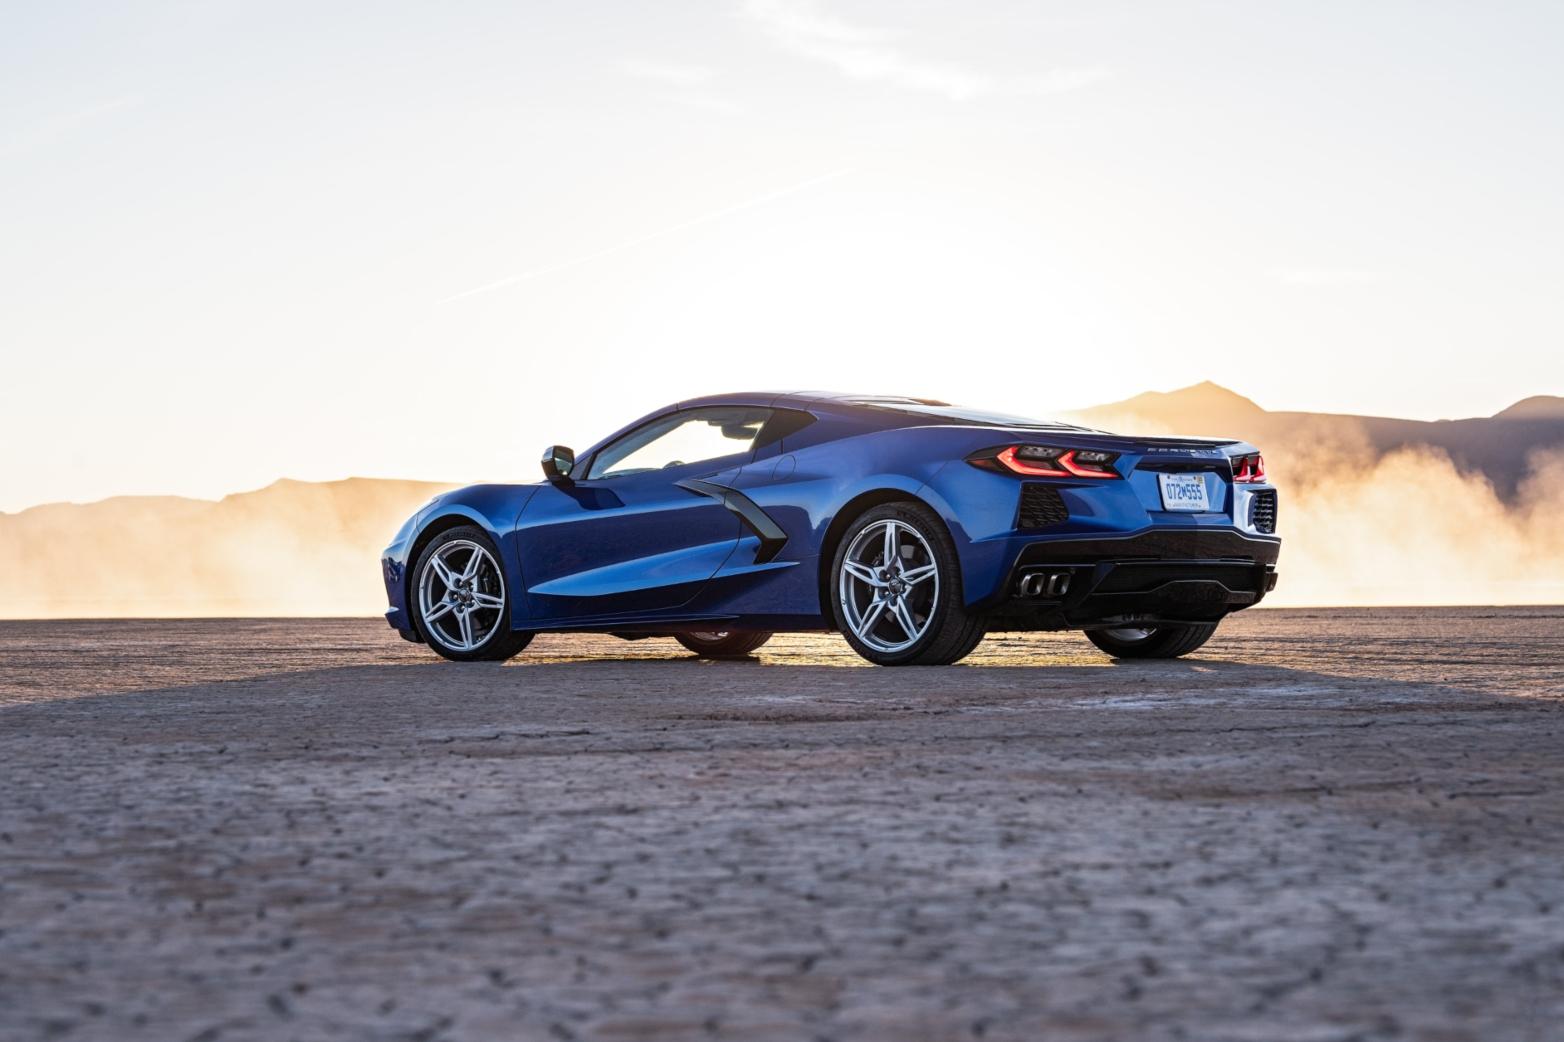 2022 Chevy Corvette C8 Gets Some Sporty Improvements